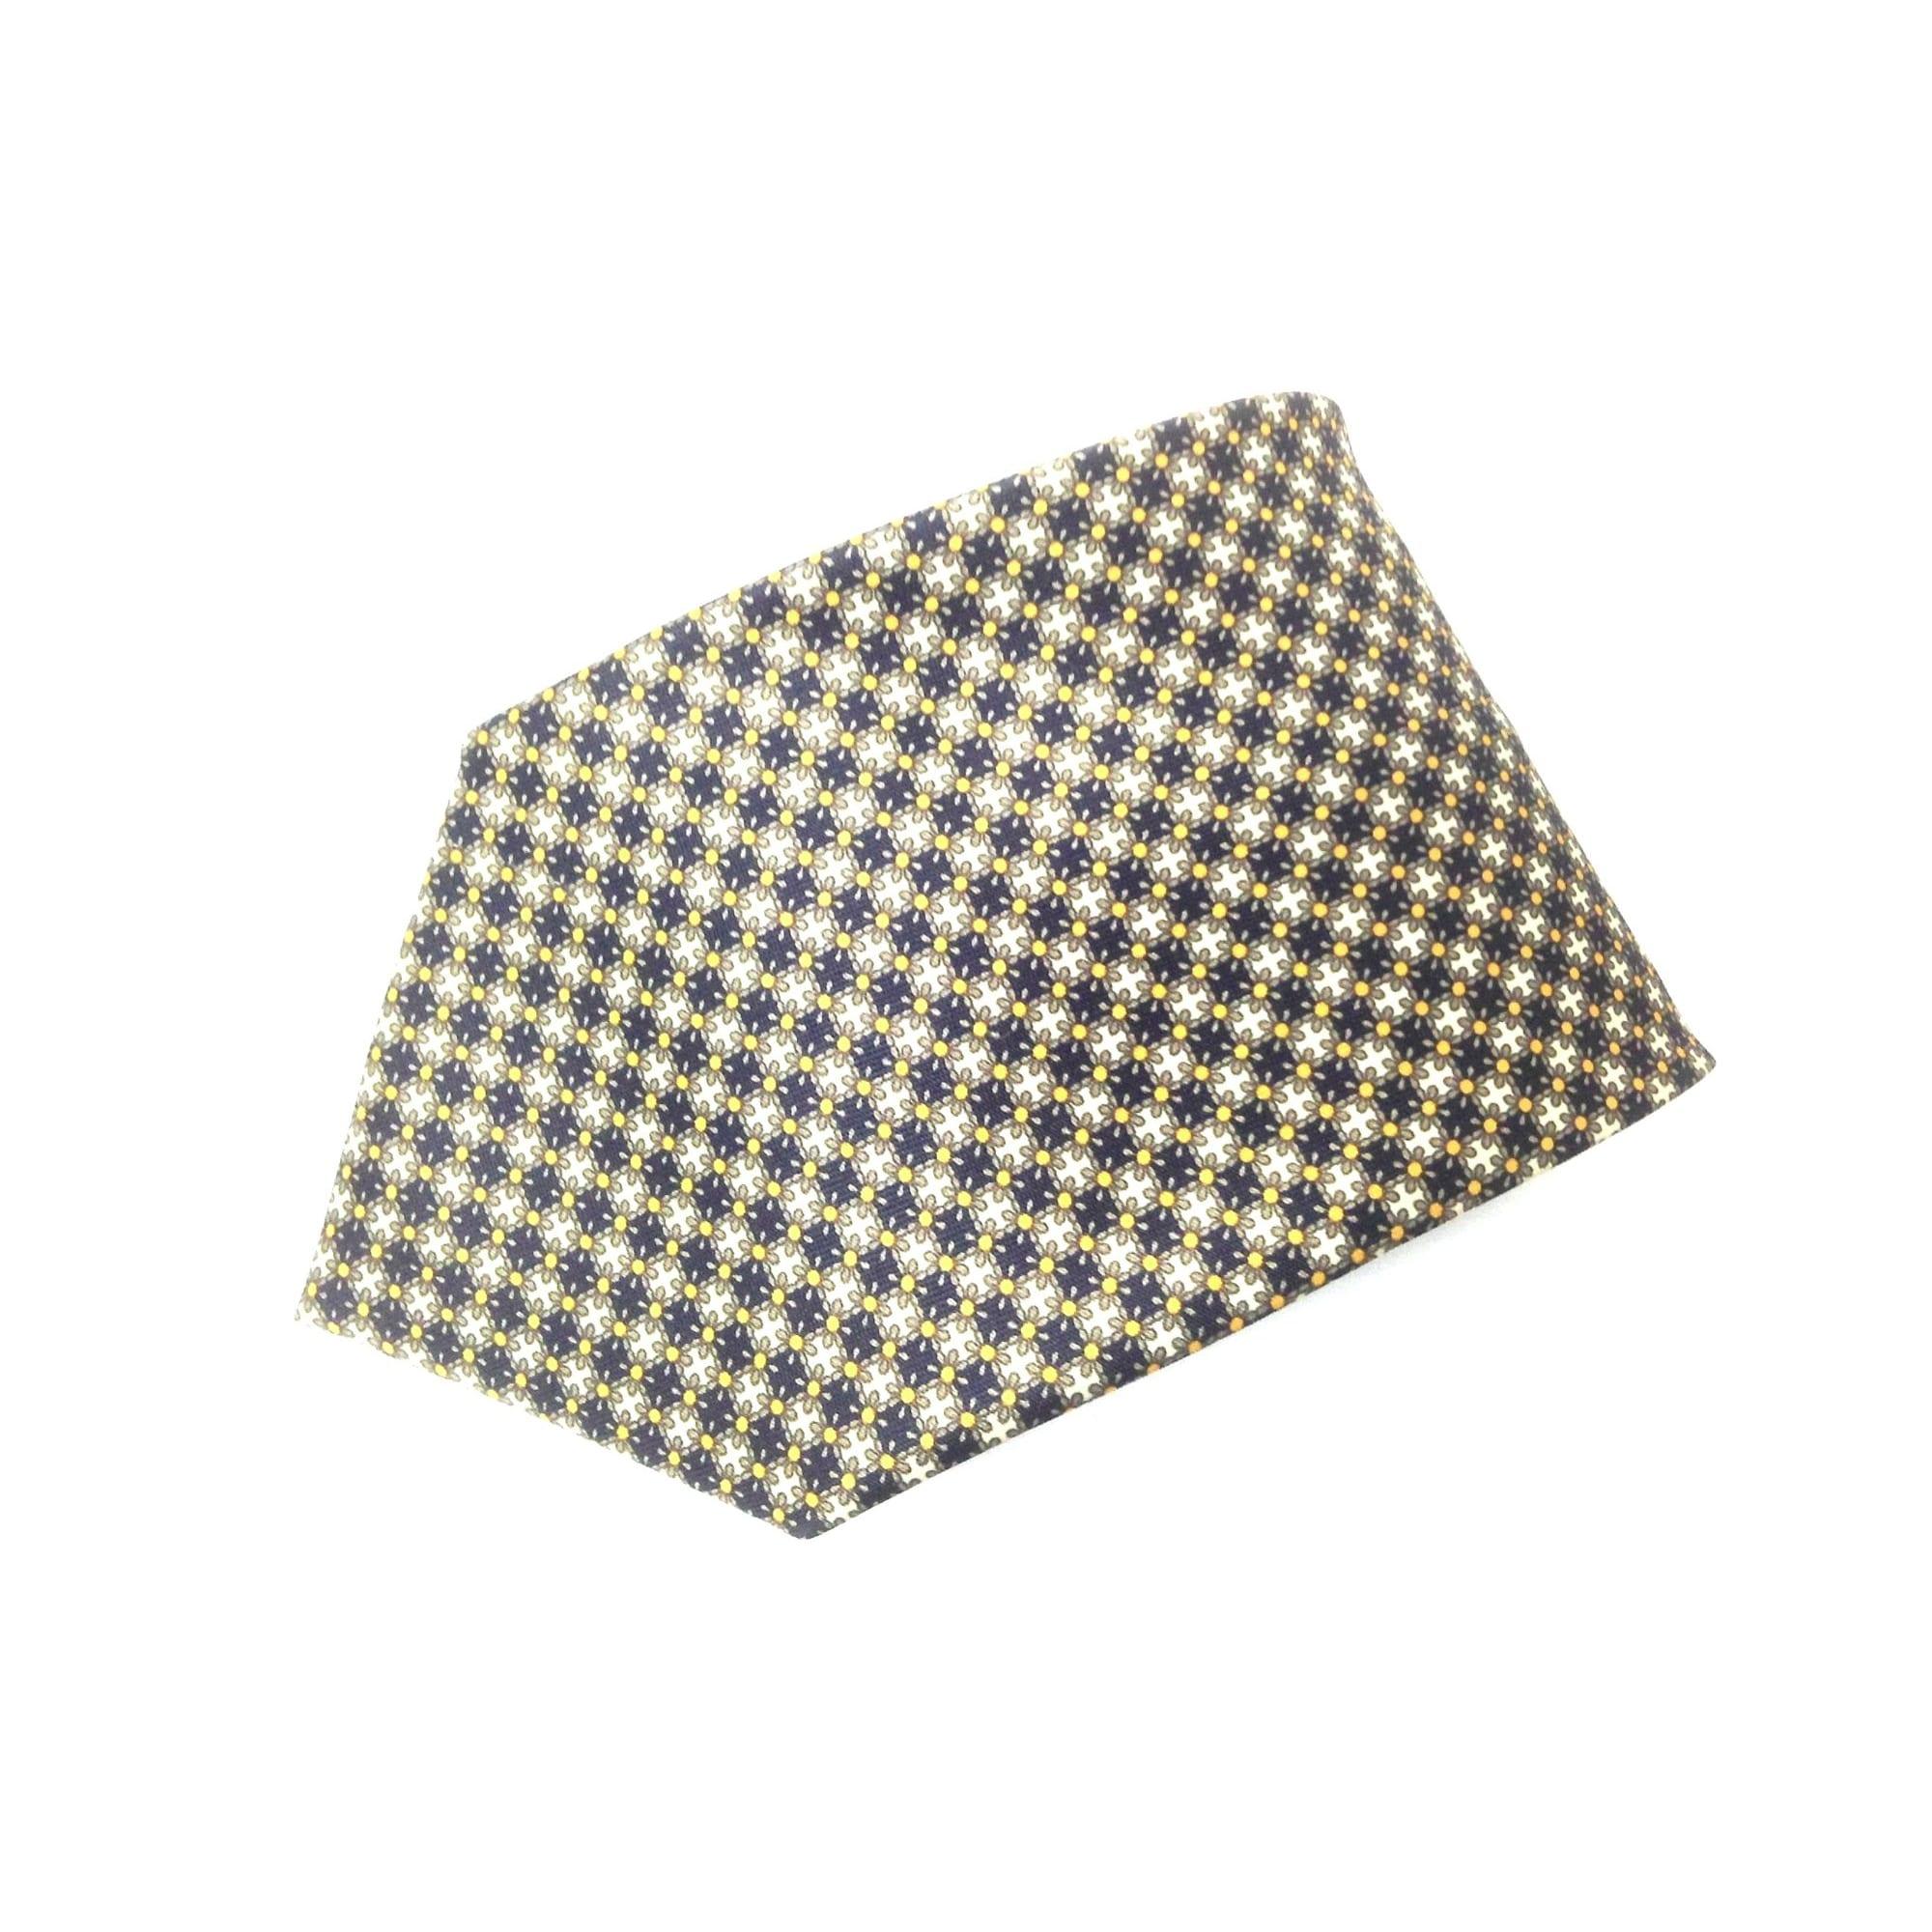 b425b2f7d5067 Cravate RENE CHAGAL Doré, bronze, cuivre